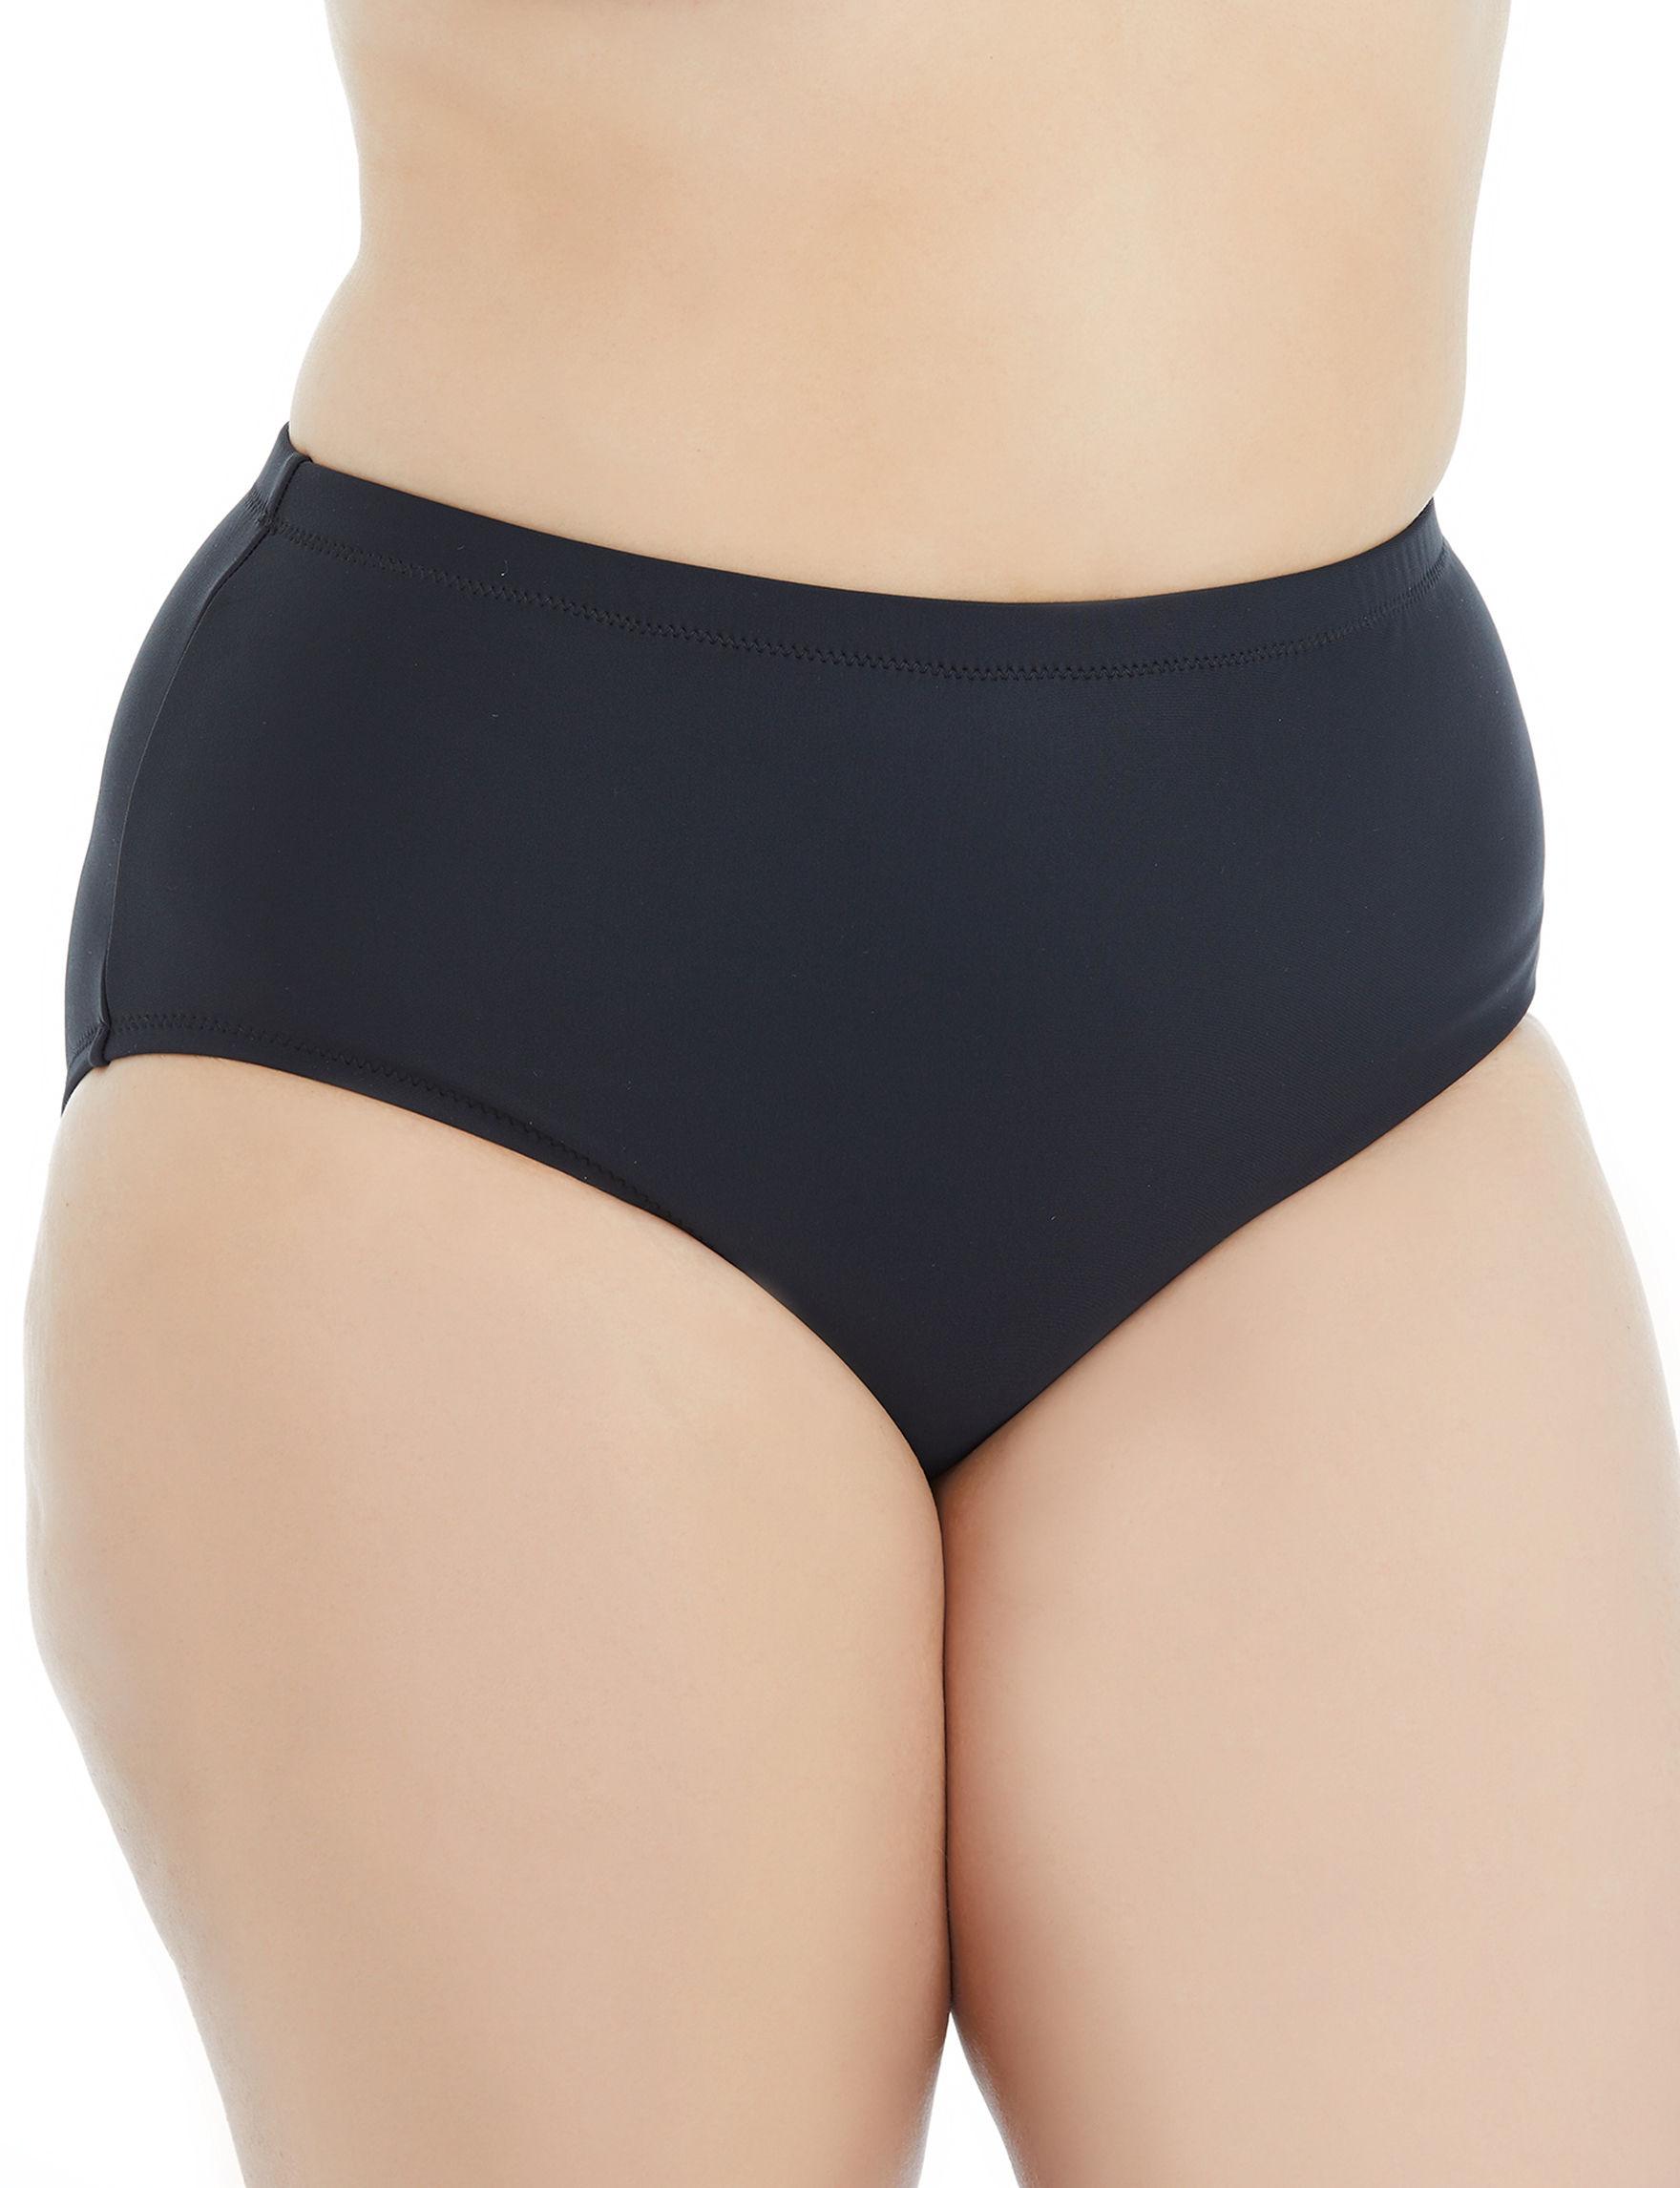 Raisins Curve Black Swimsuit Bottoms High Waist